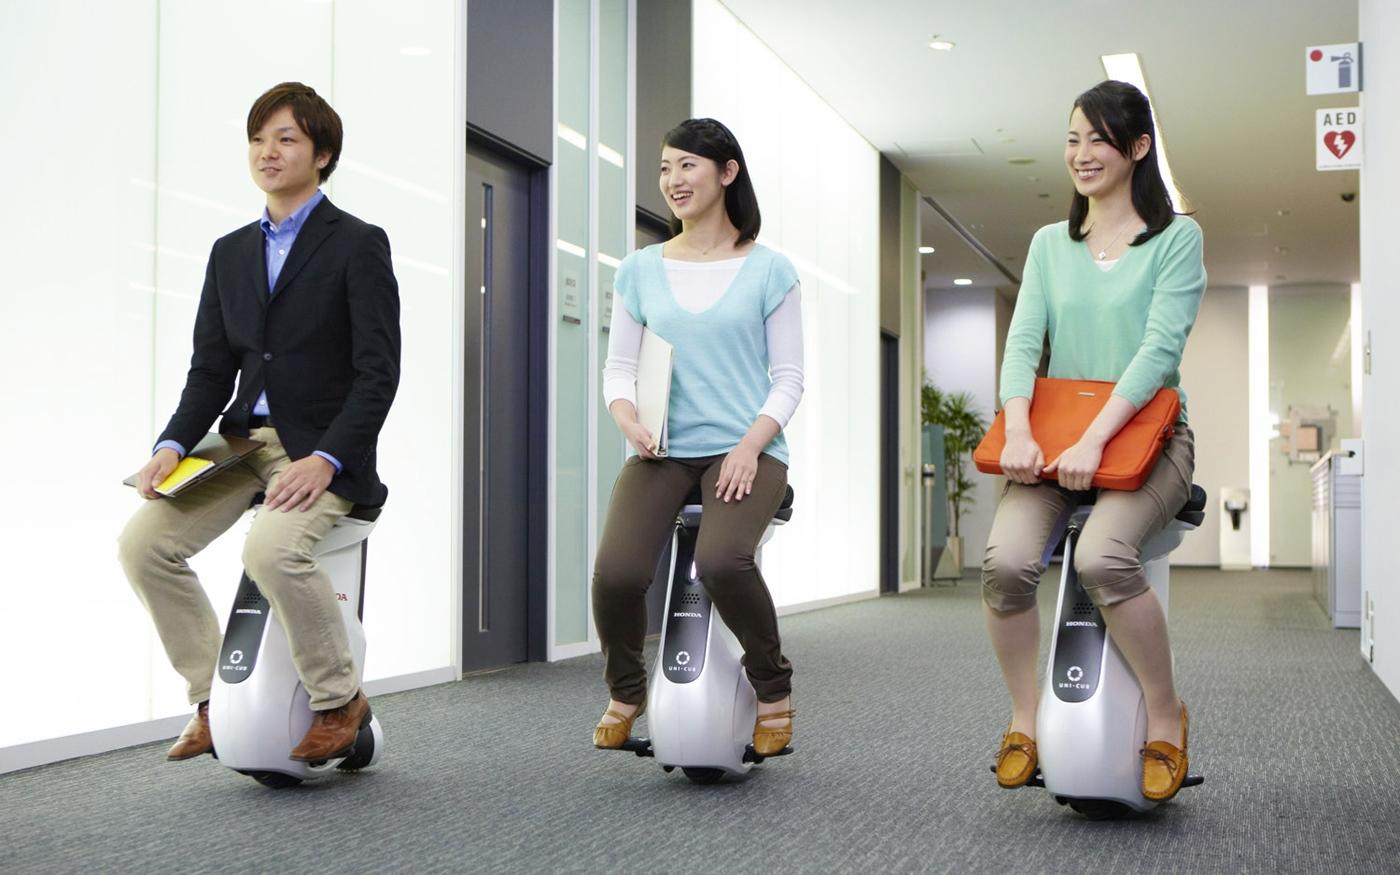 Honda UNI-CUB, personal mobility, personal transporter